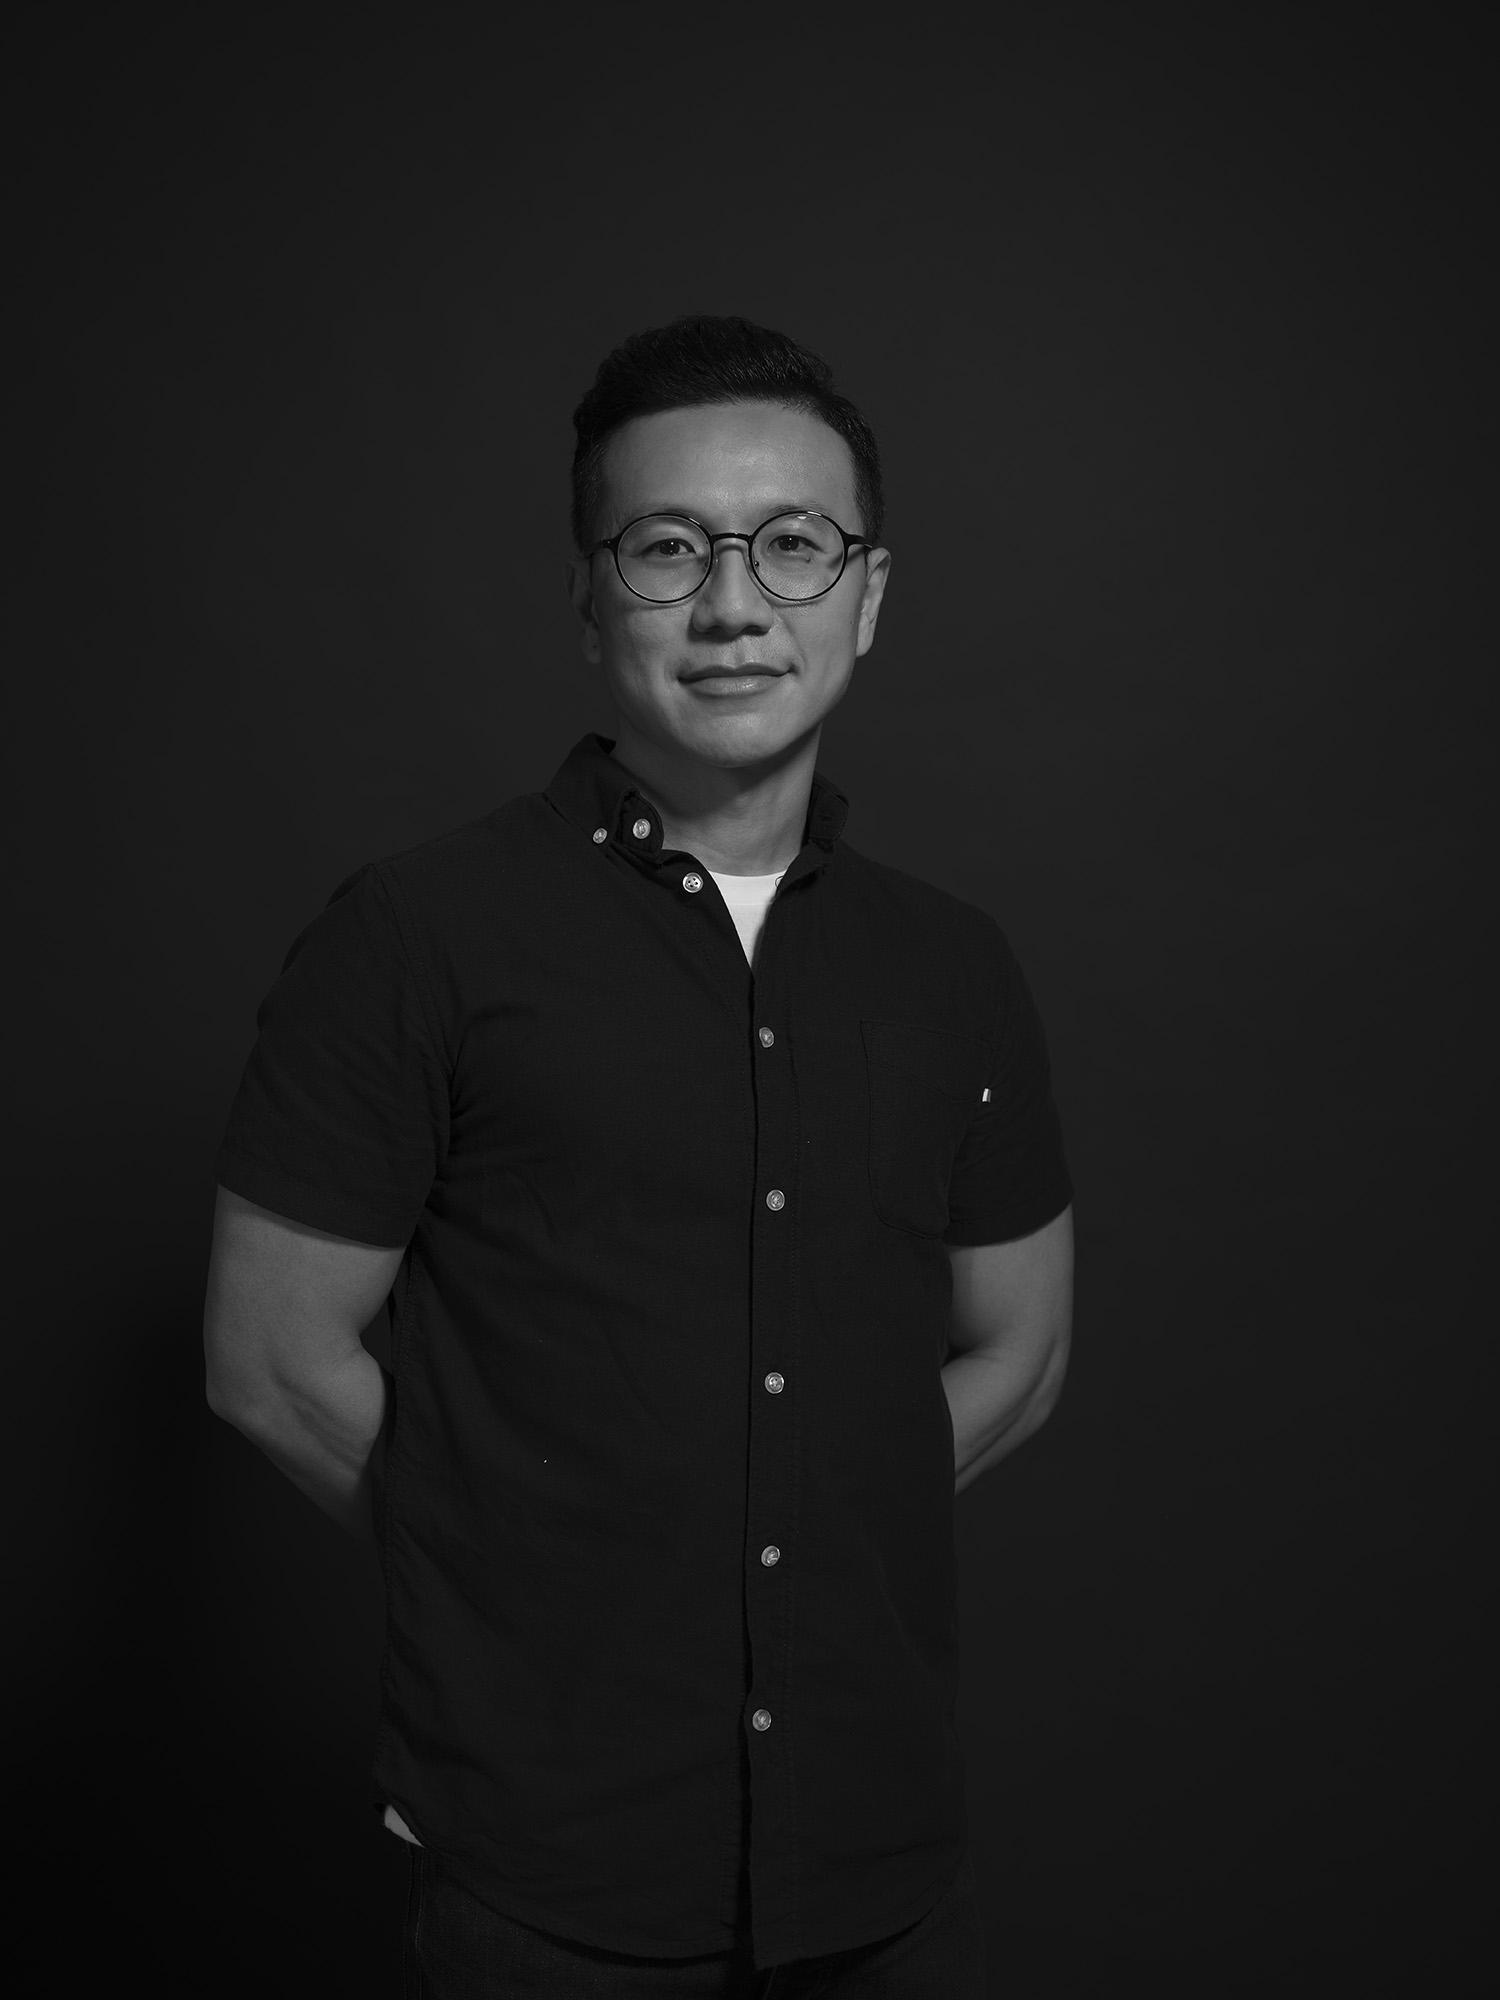 Ramboll Black and White Photography Portrait Photographer Singapore COCO Creative Studio 21